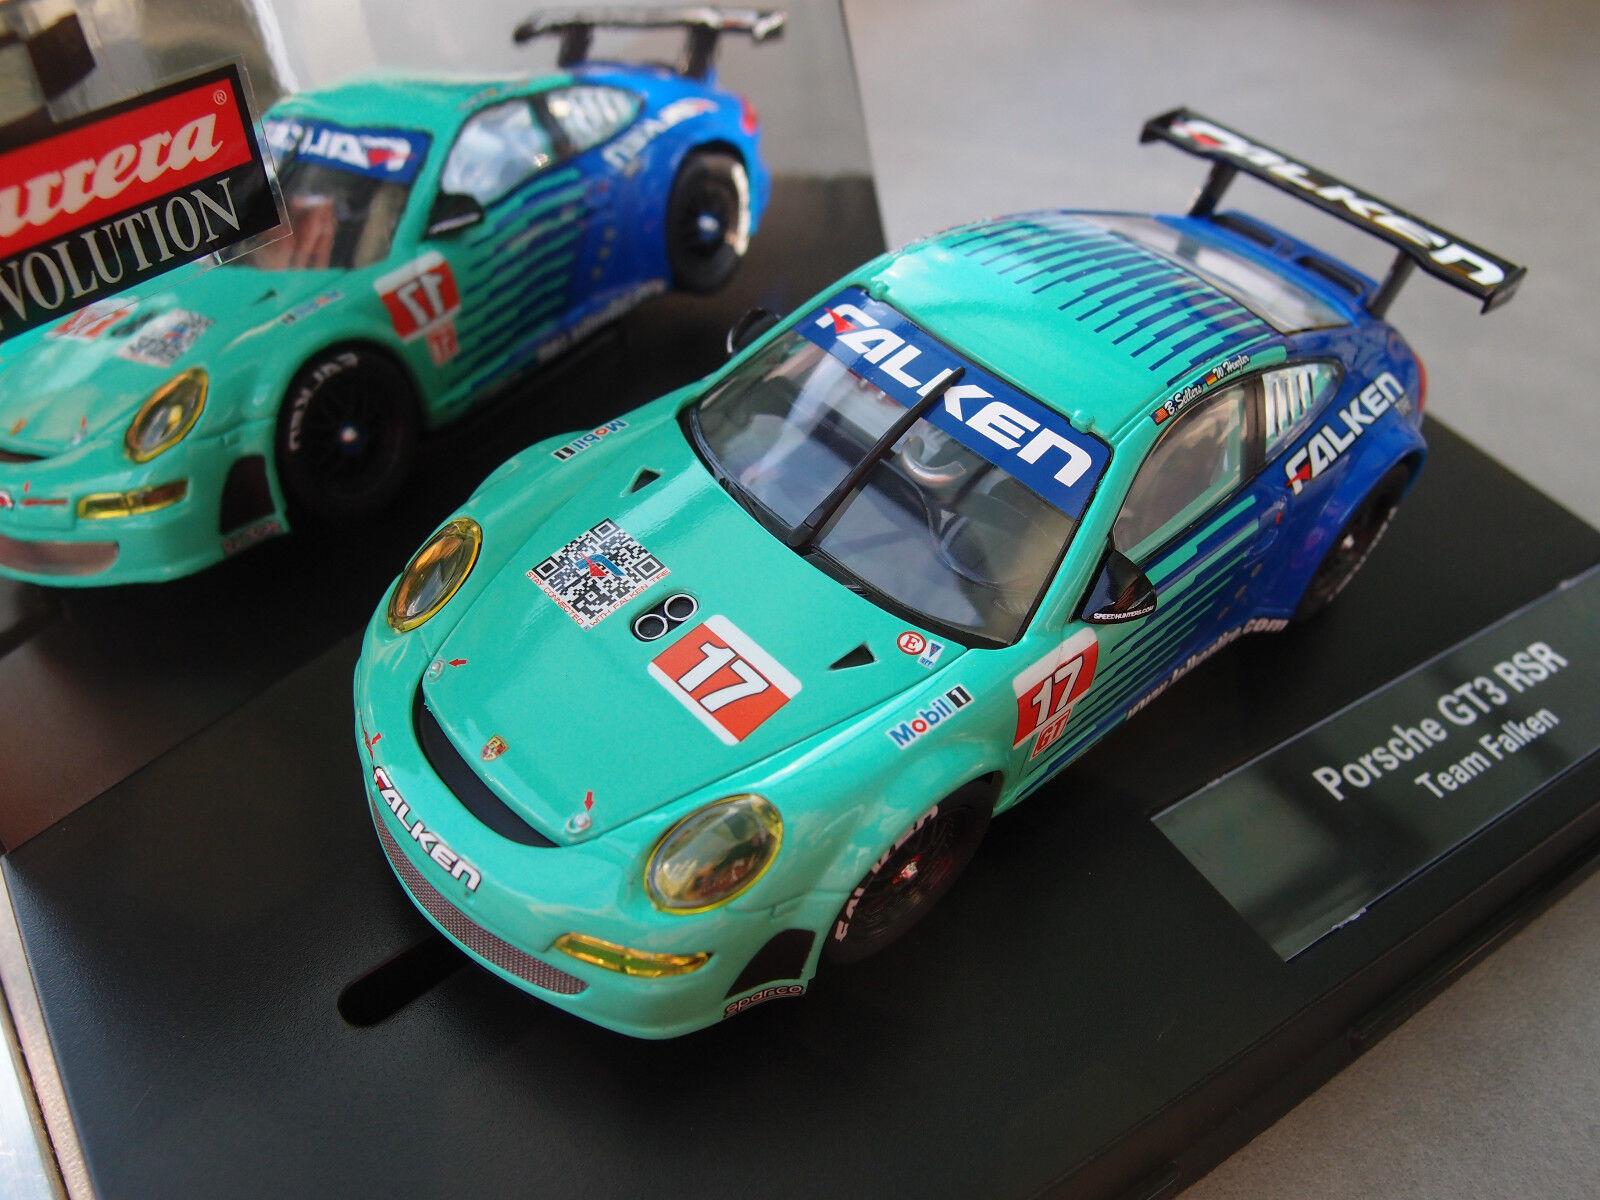 Carrera Evolution 27429 Porsche GT3 RSR   Team Falken, no. 17  , 2009